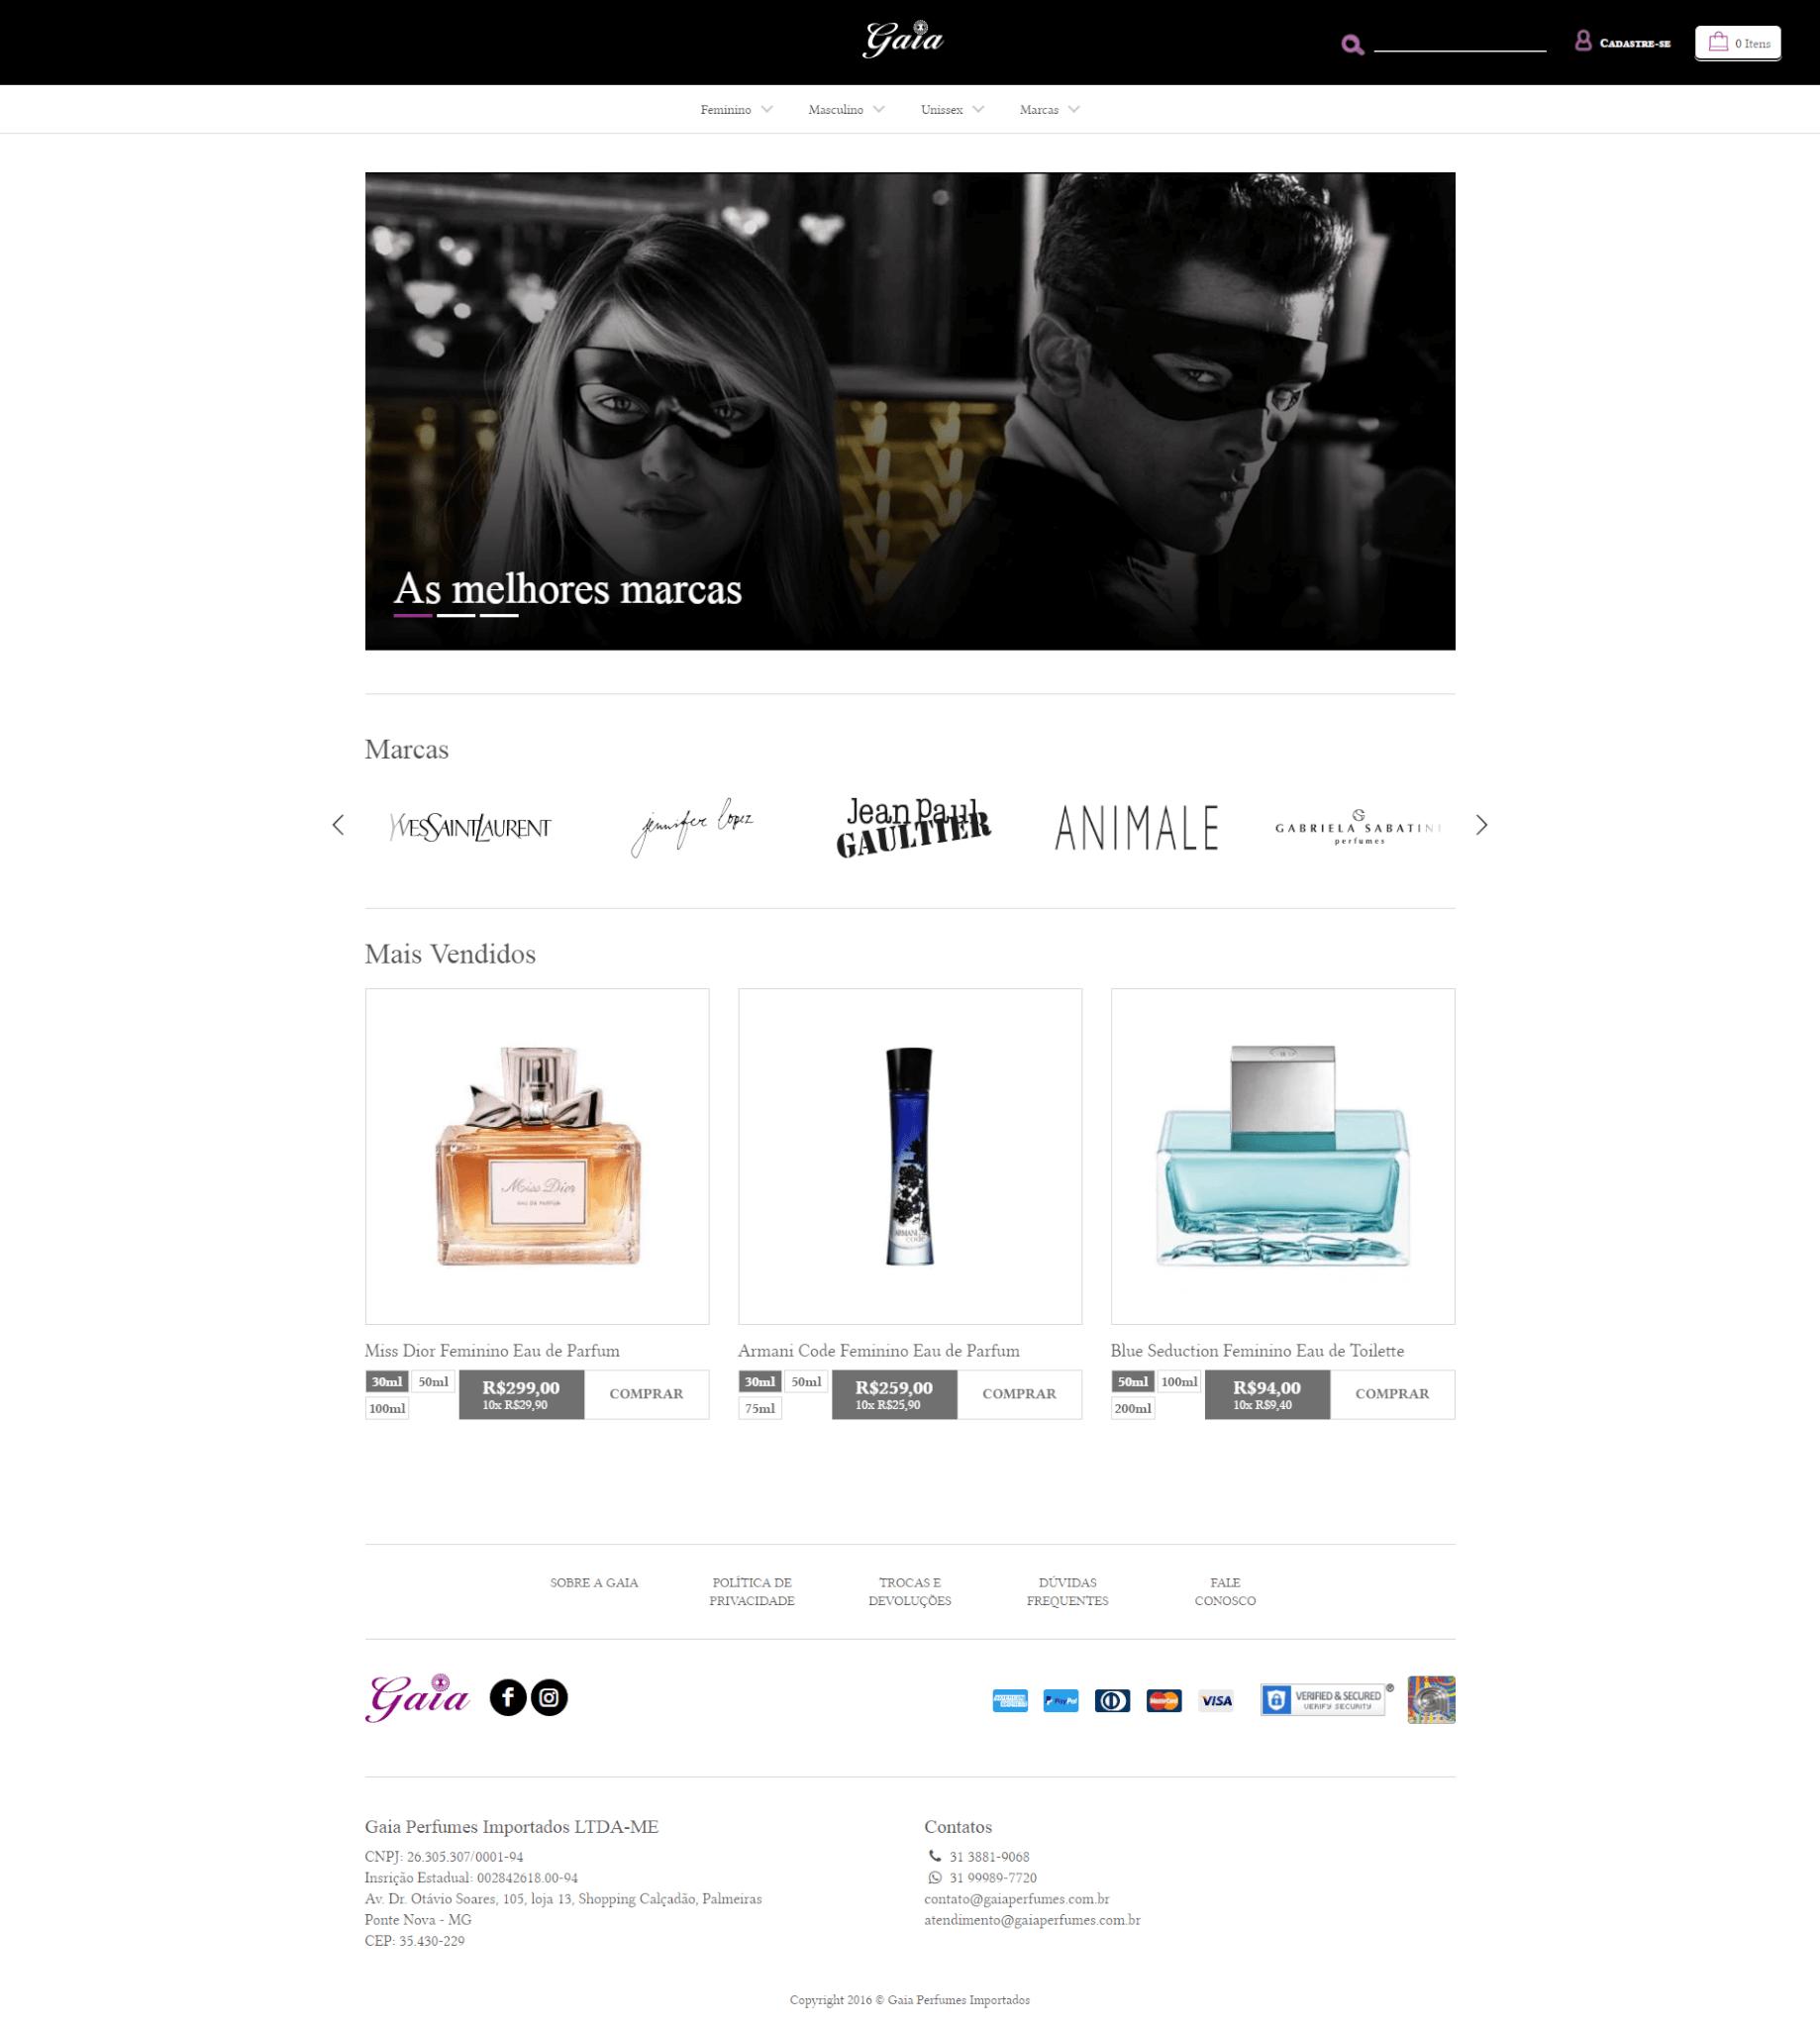 Gaia Perfumes